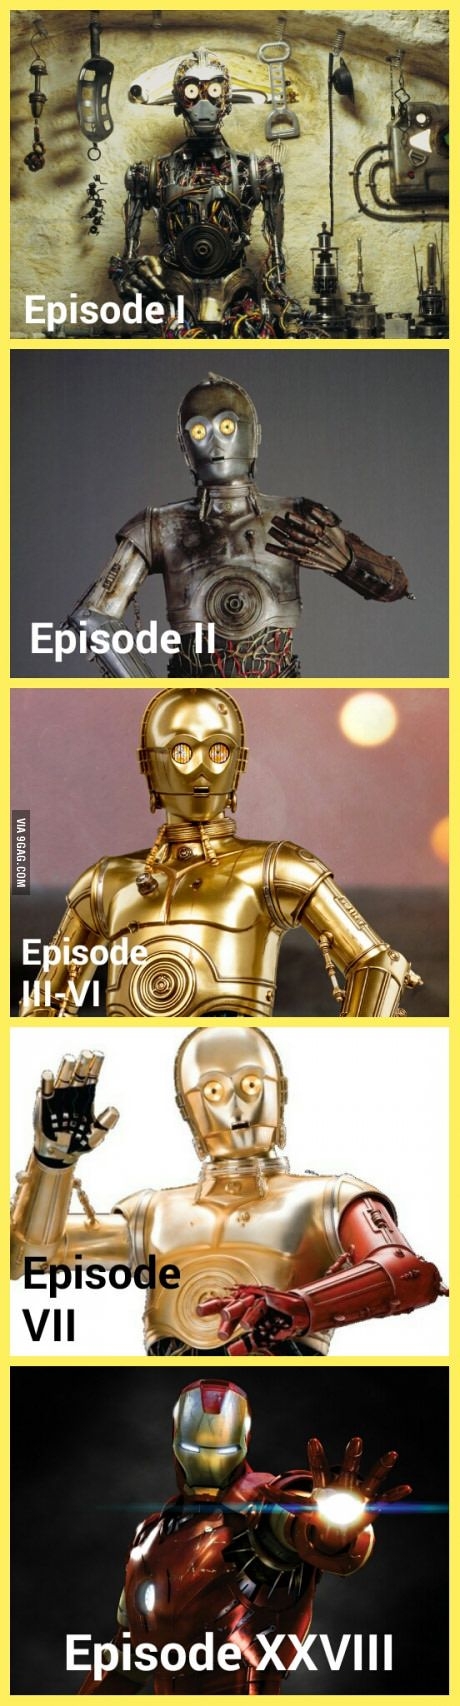 C-3PO evolution